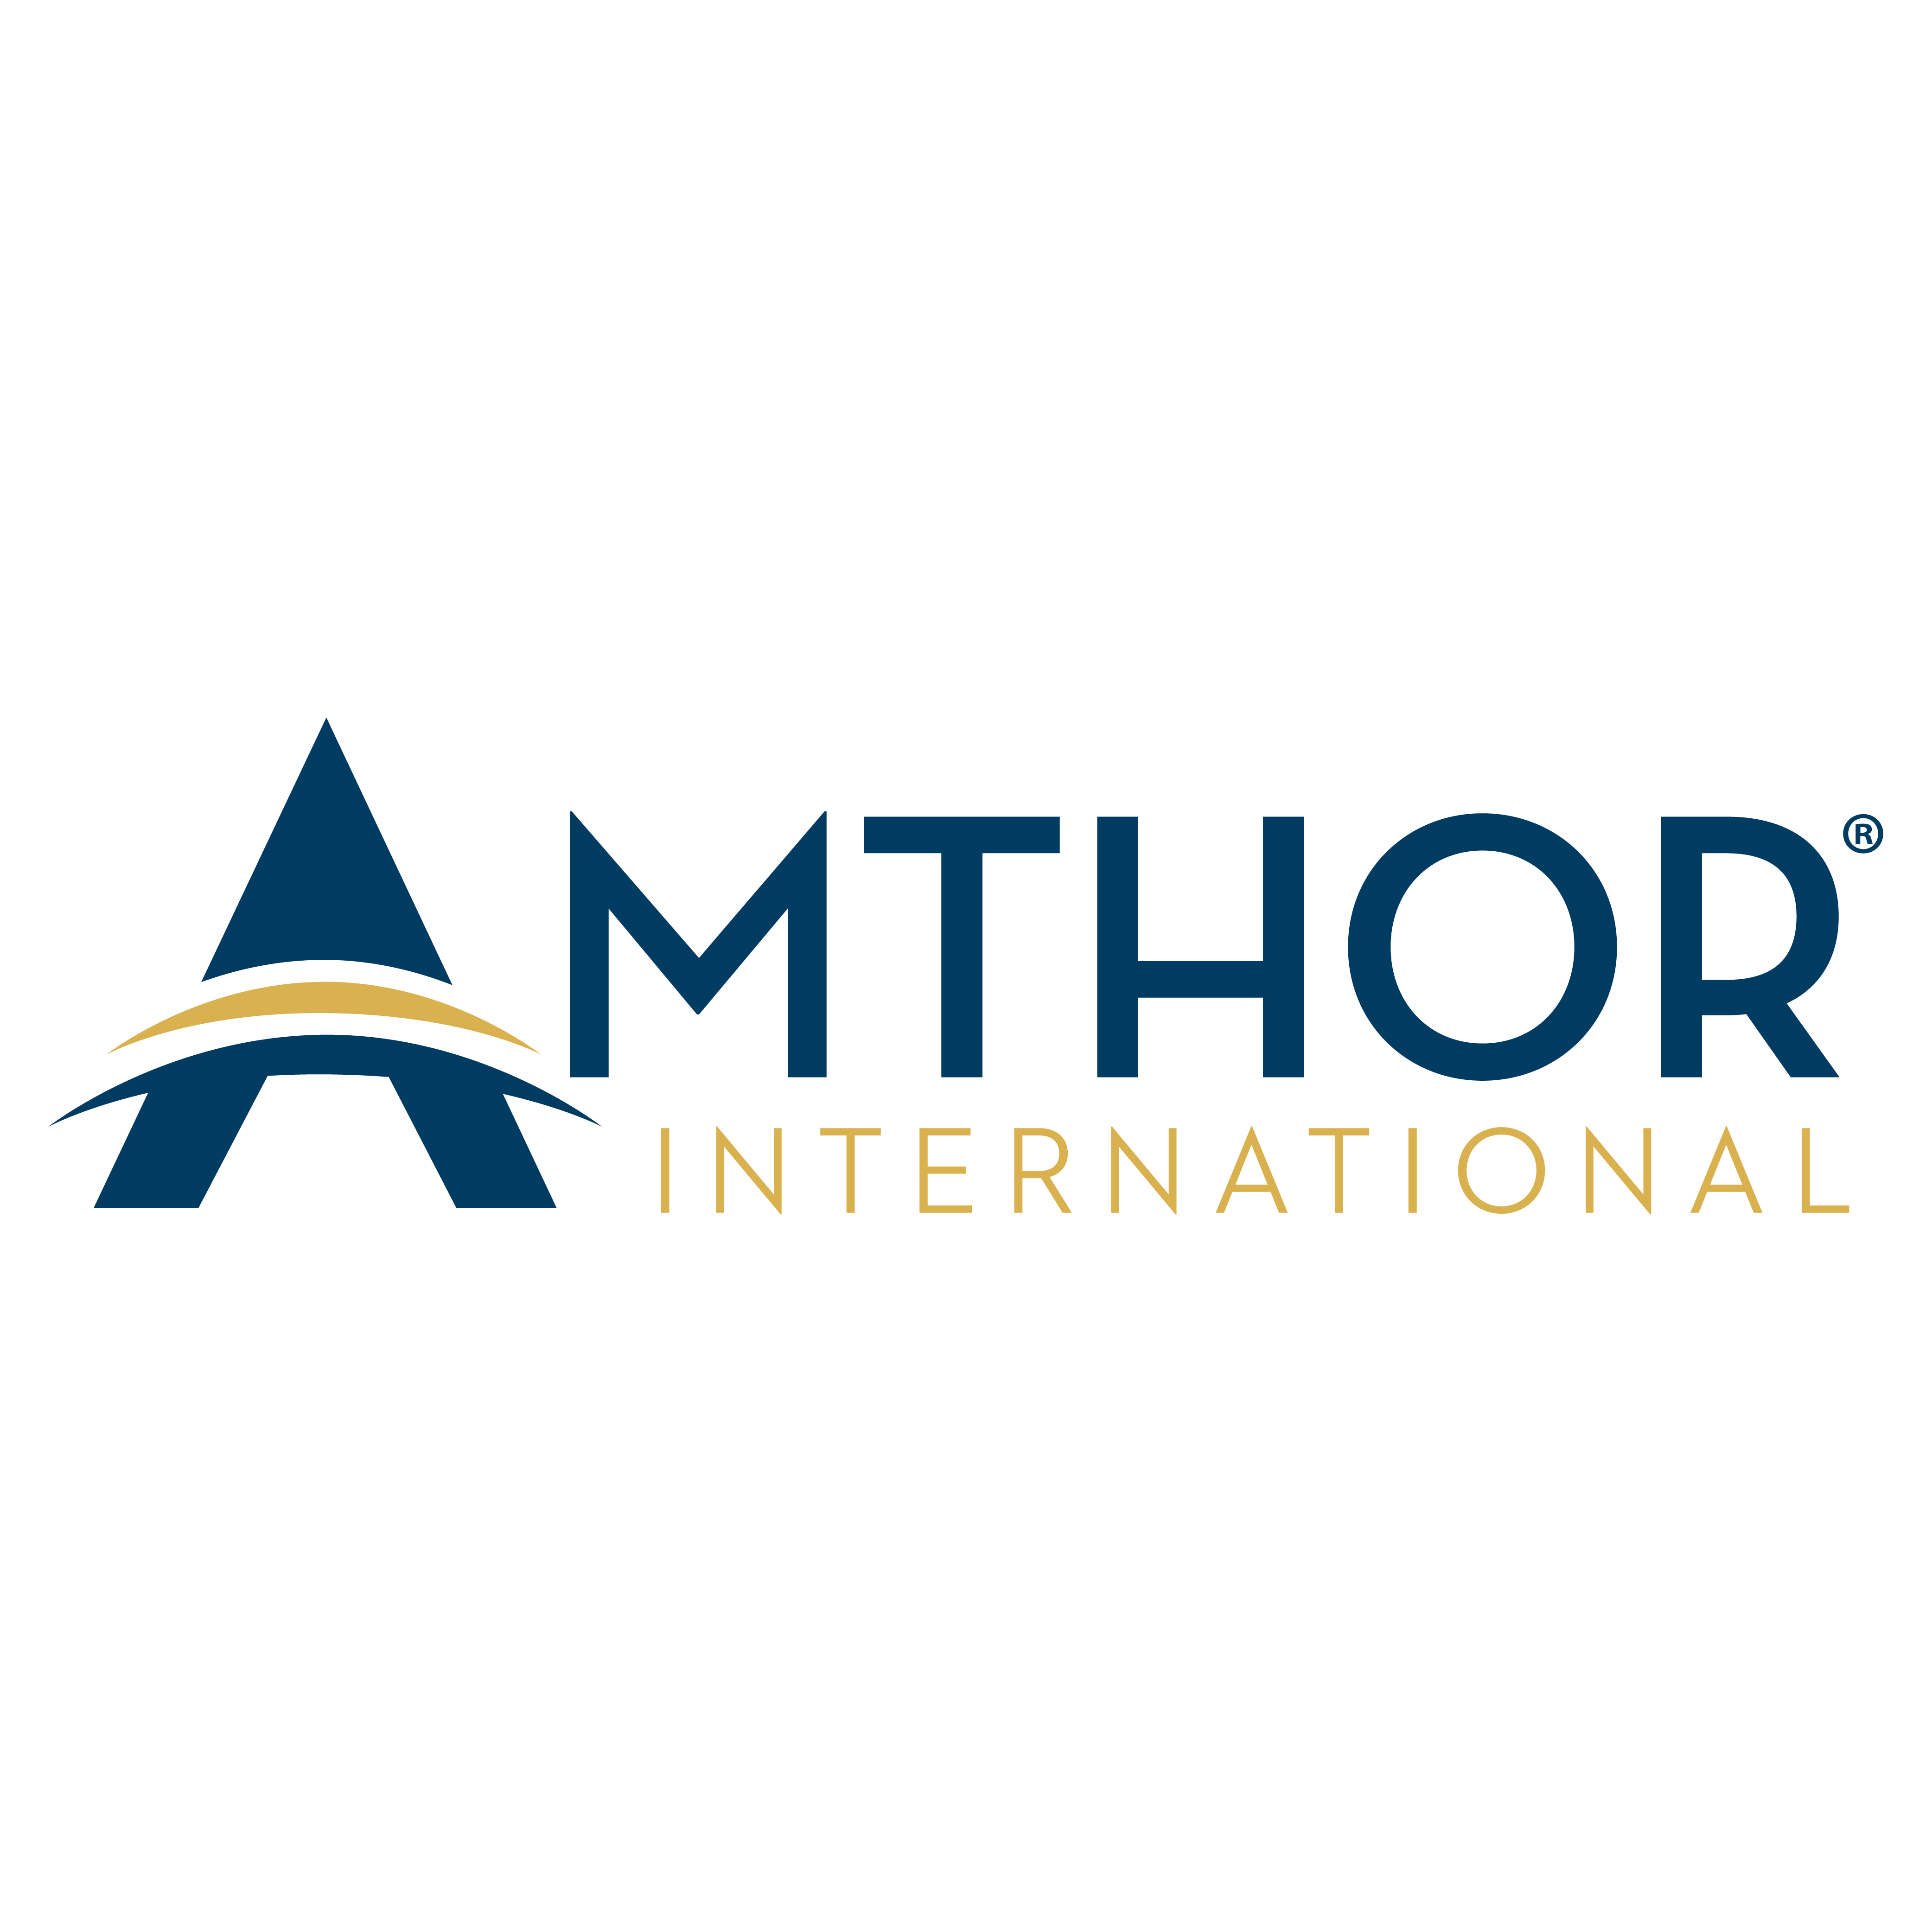 Amthor International Logo links to Case Study